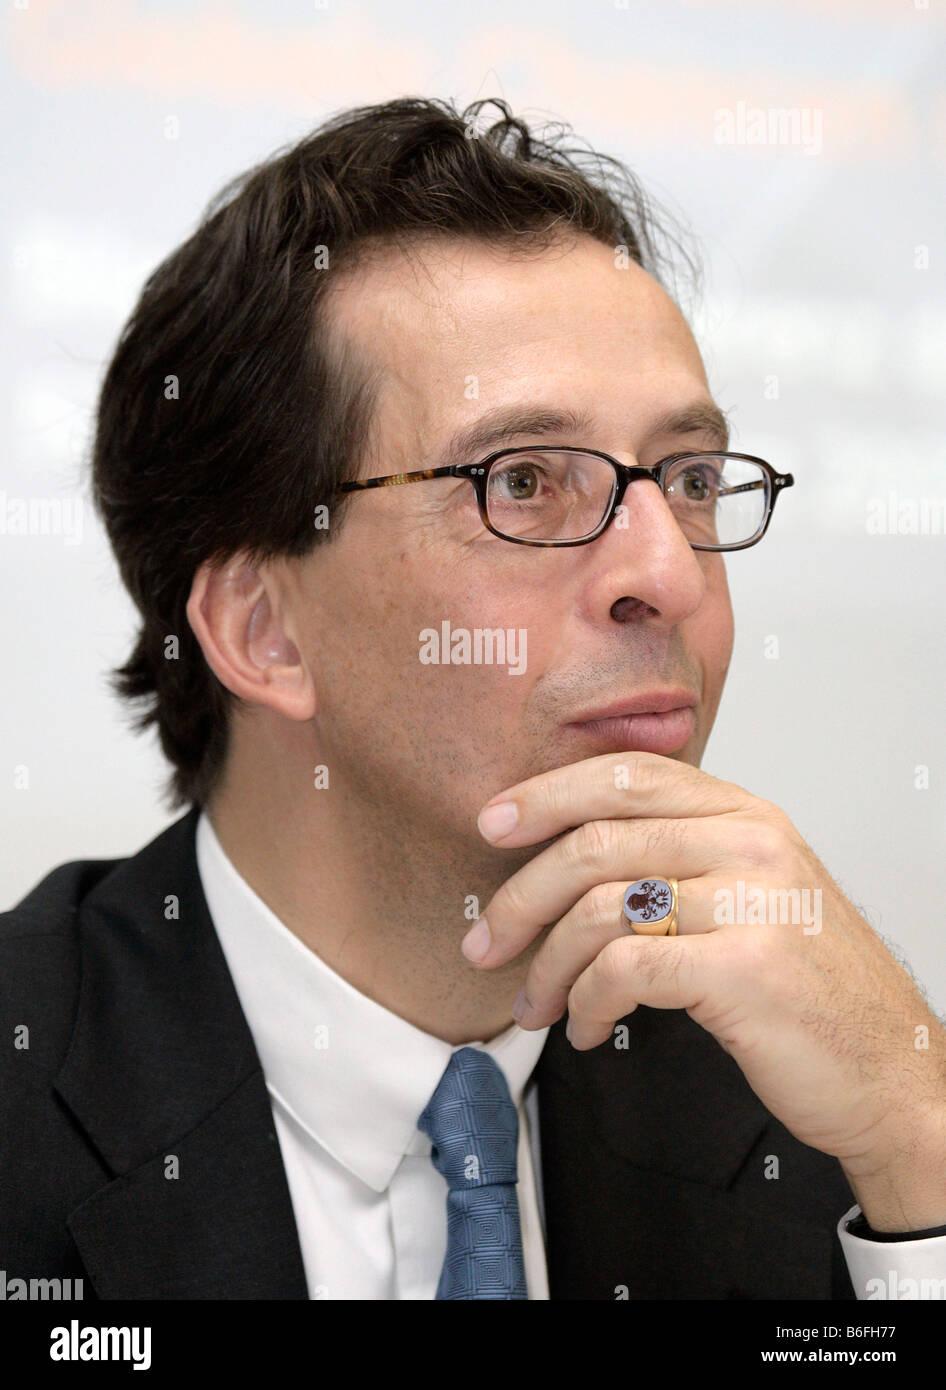 Christian Weller von Ahlefeld, Finance Director of the GfK AG, Gesellschaft fuer Konsumforschung or Consumer Research - Stock Image